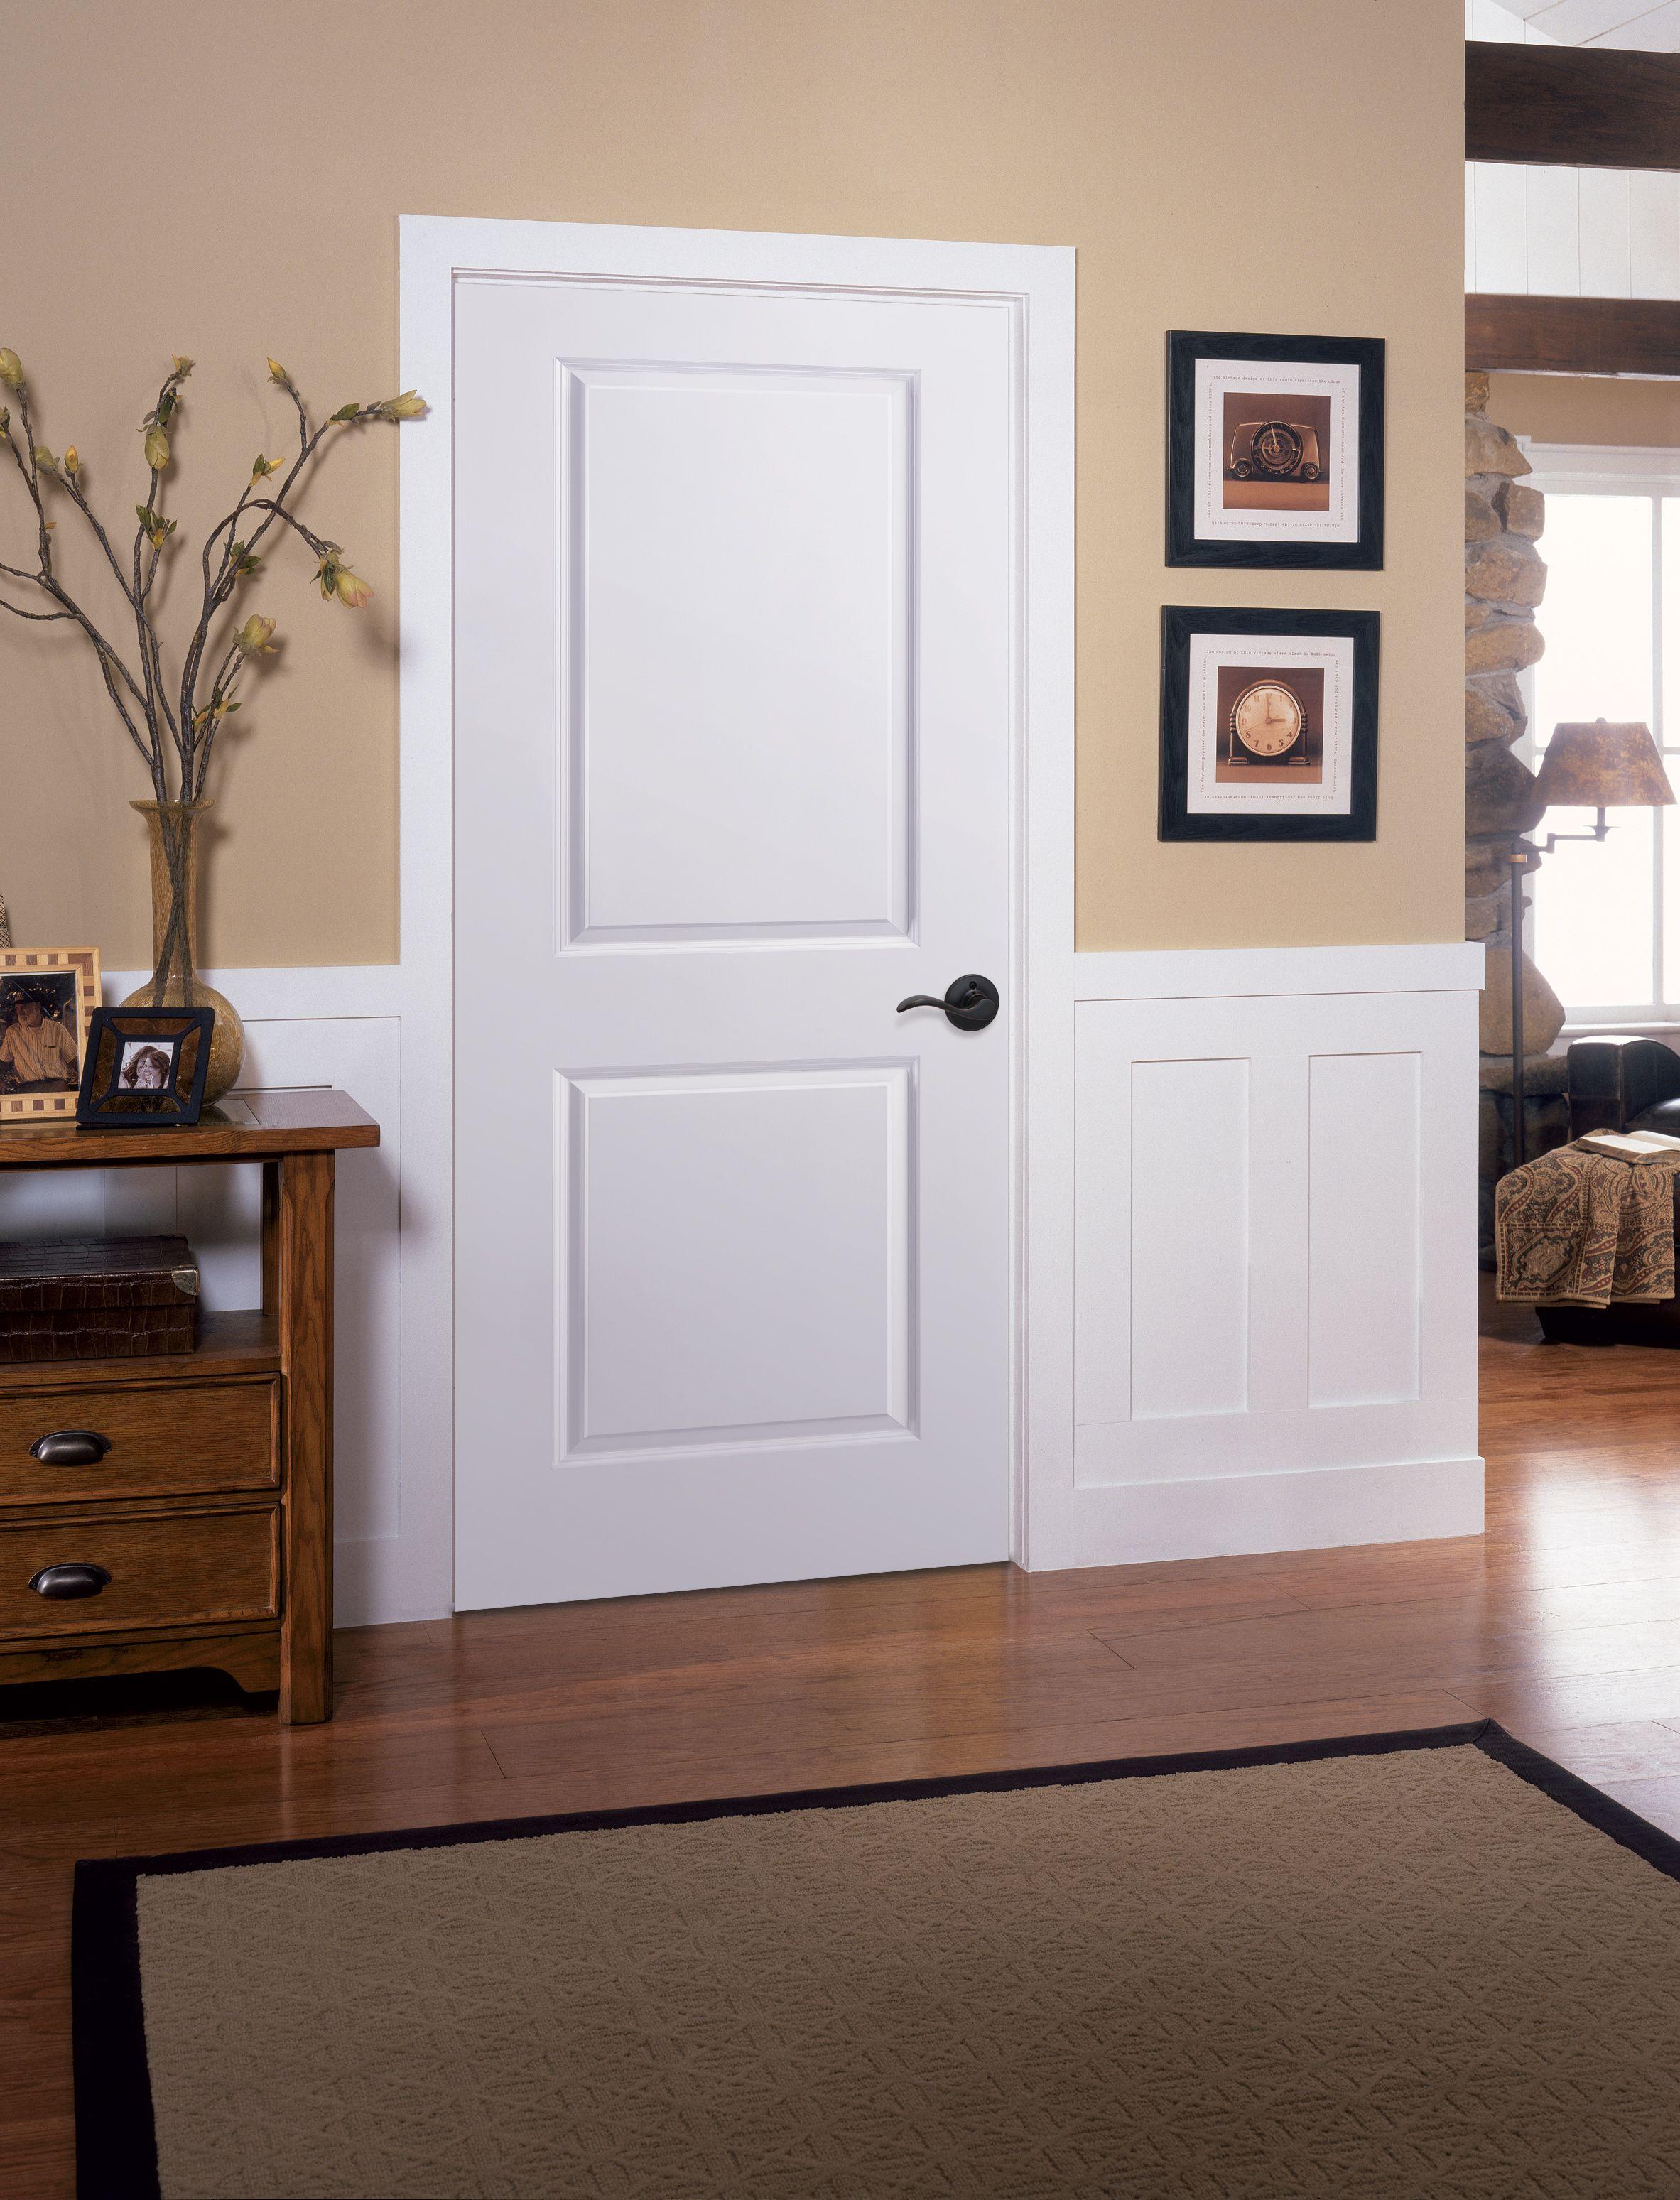 Masonite Classics Series Hfj2ps Interior Doors Prehung Interior Doors Custom Interior Doors Doors Interior